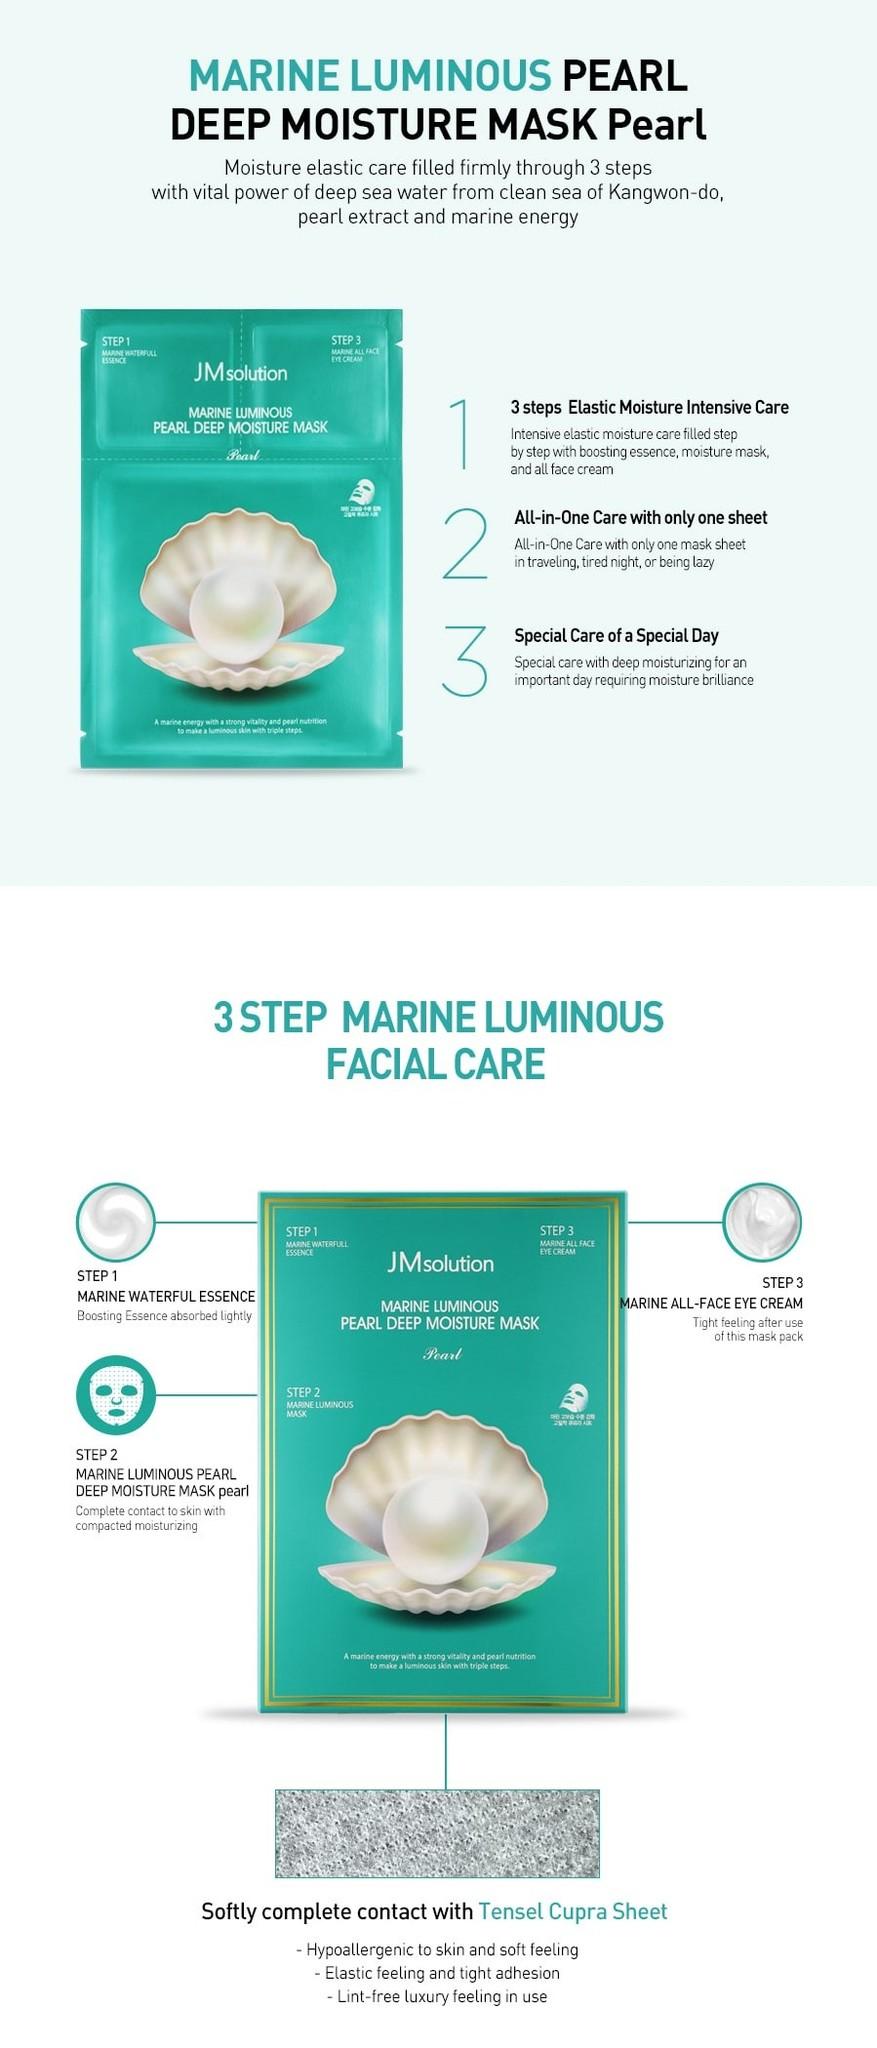 Marine Luminous Pearl Deep Moisture Mask-3